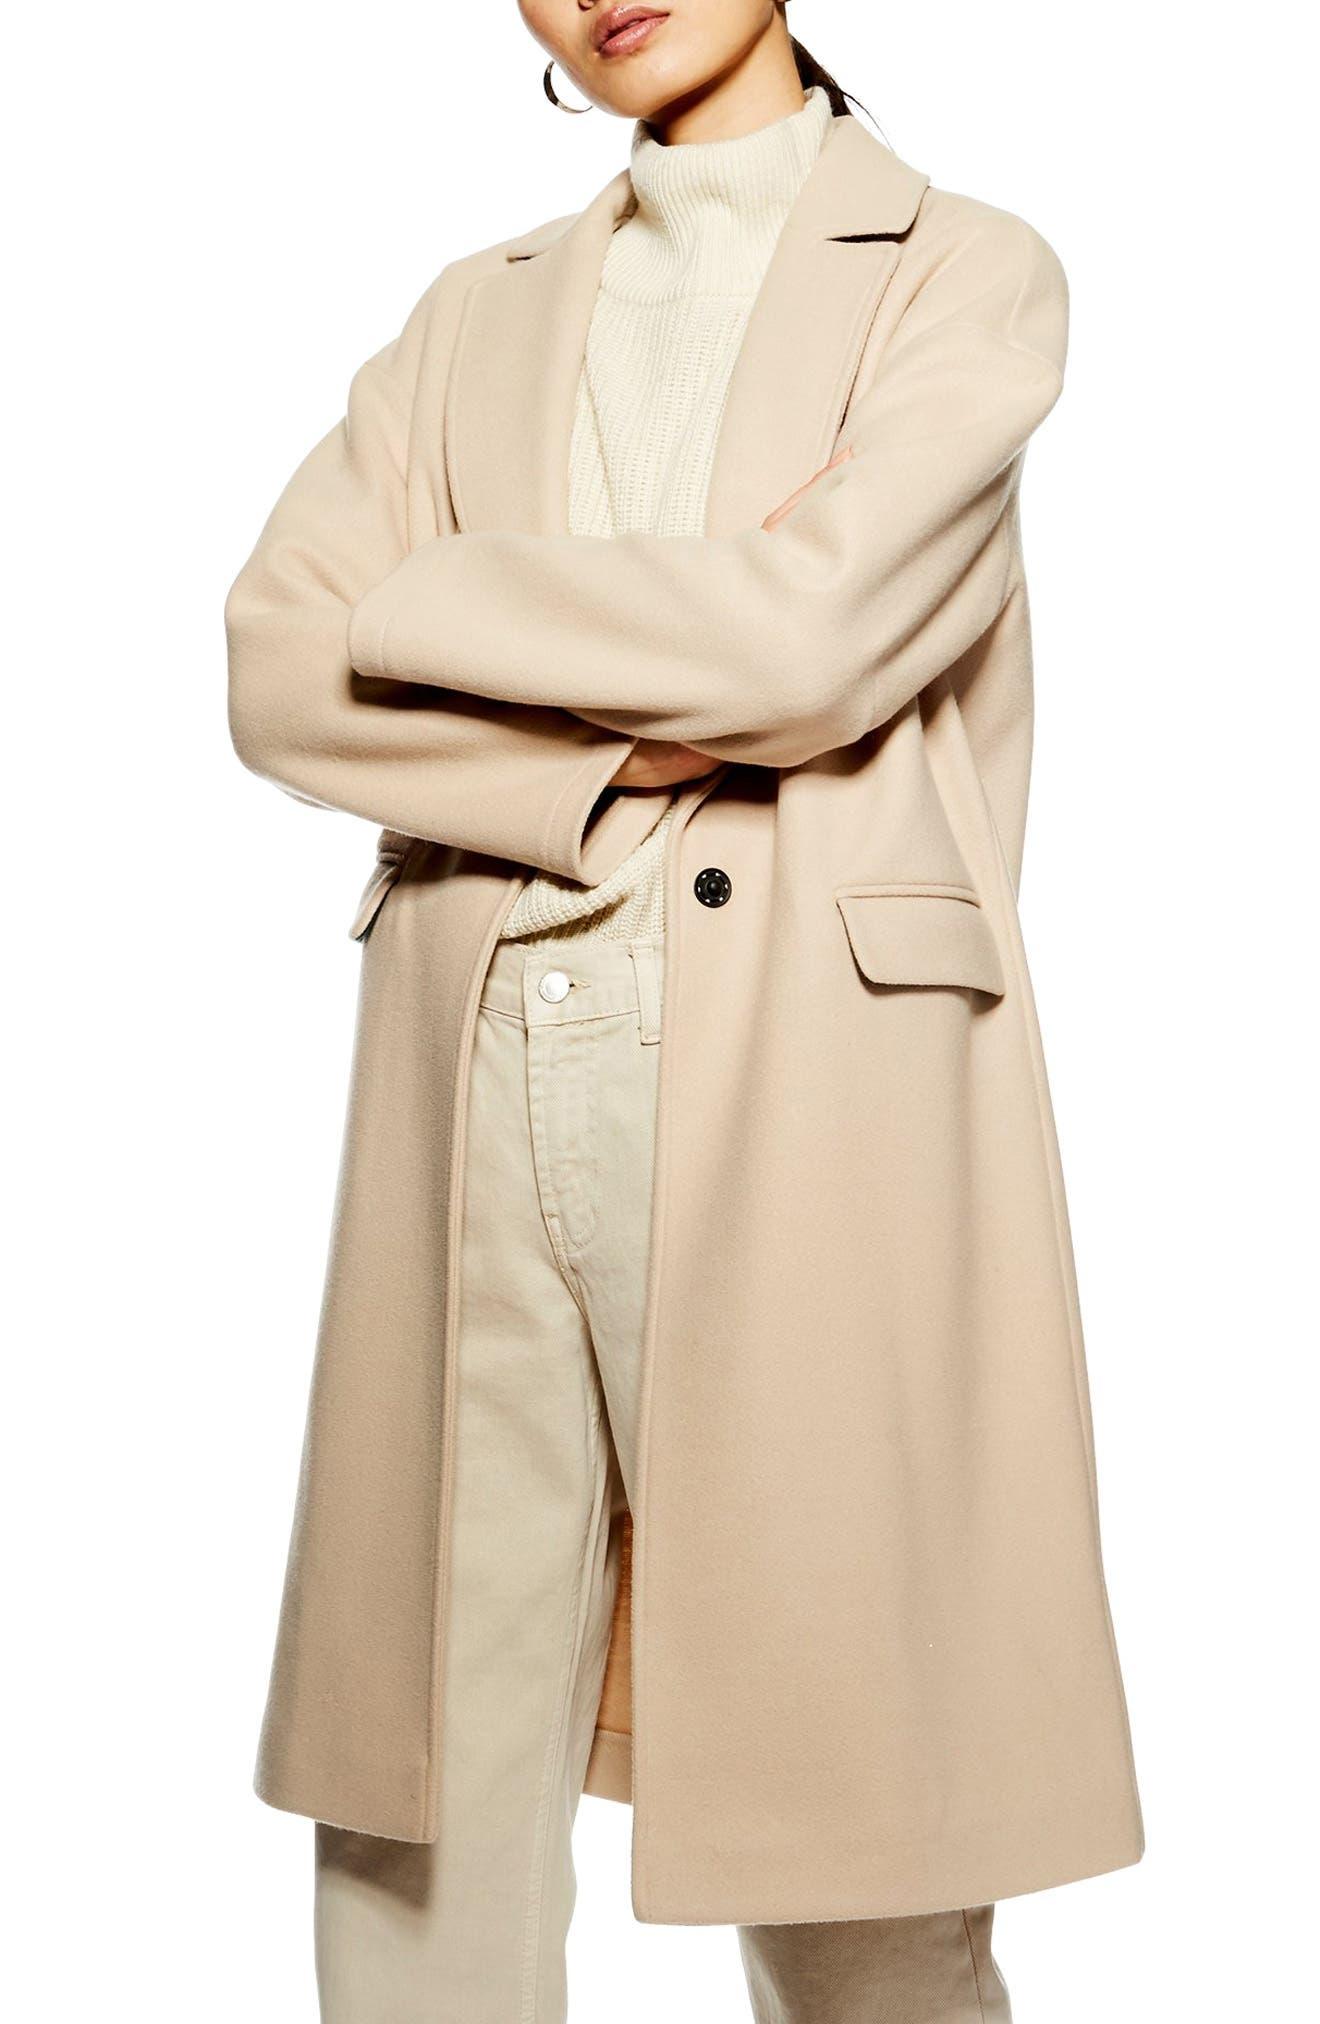 TOPSHOP Lily Knit Back Midi Coat, Main, color, 250